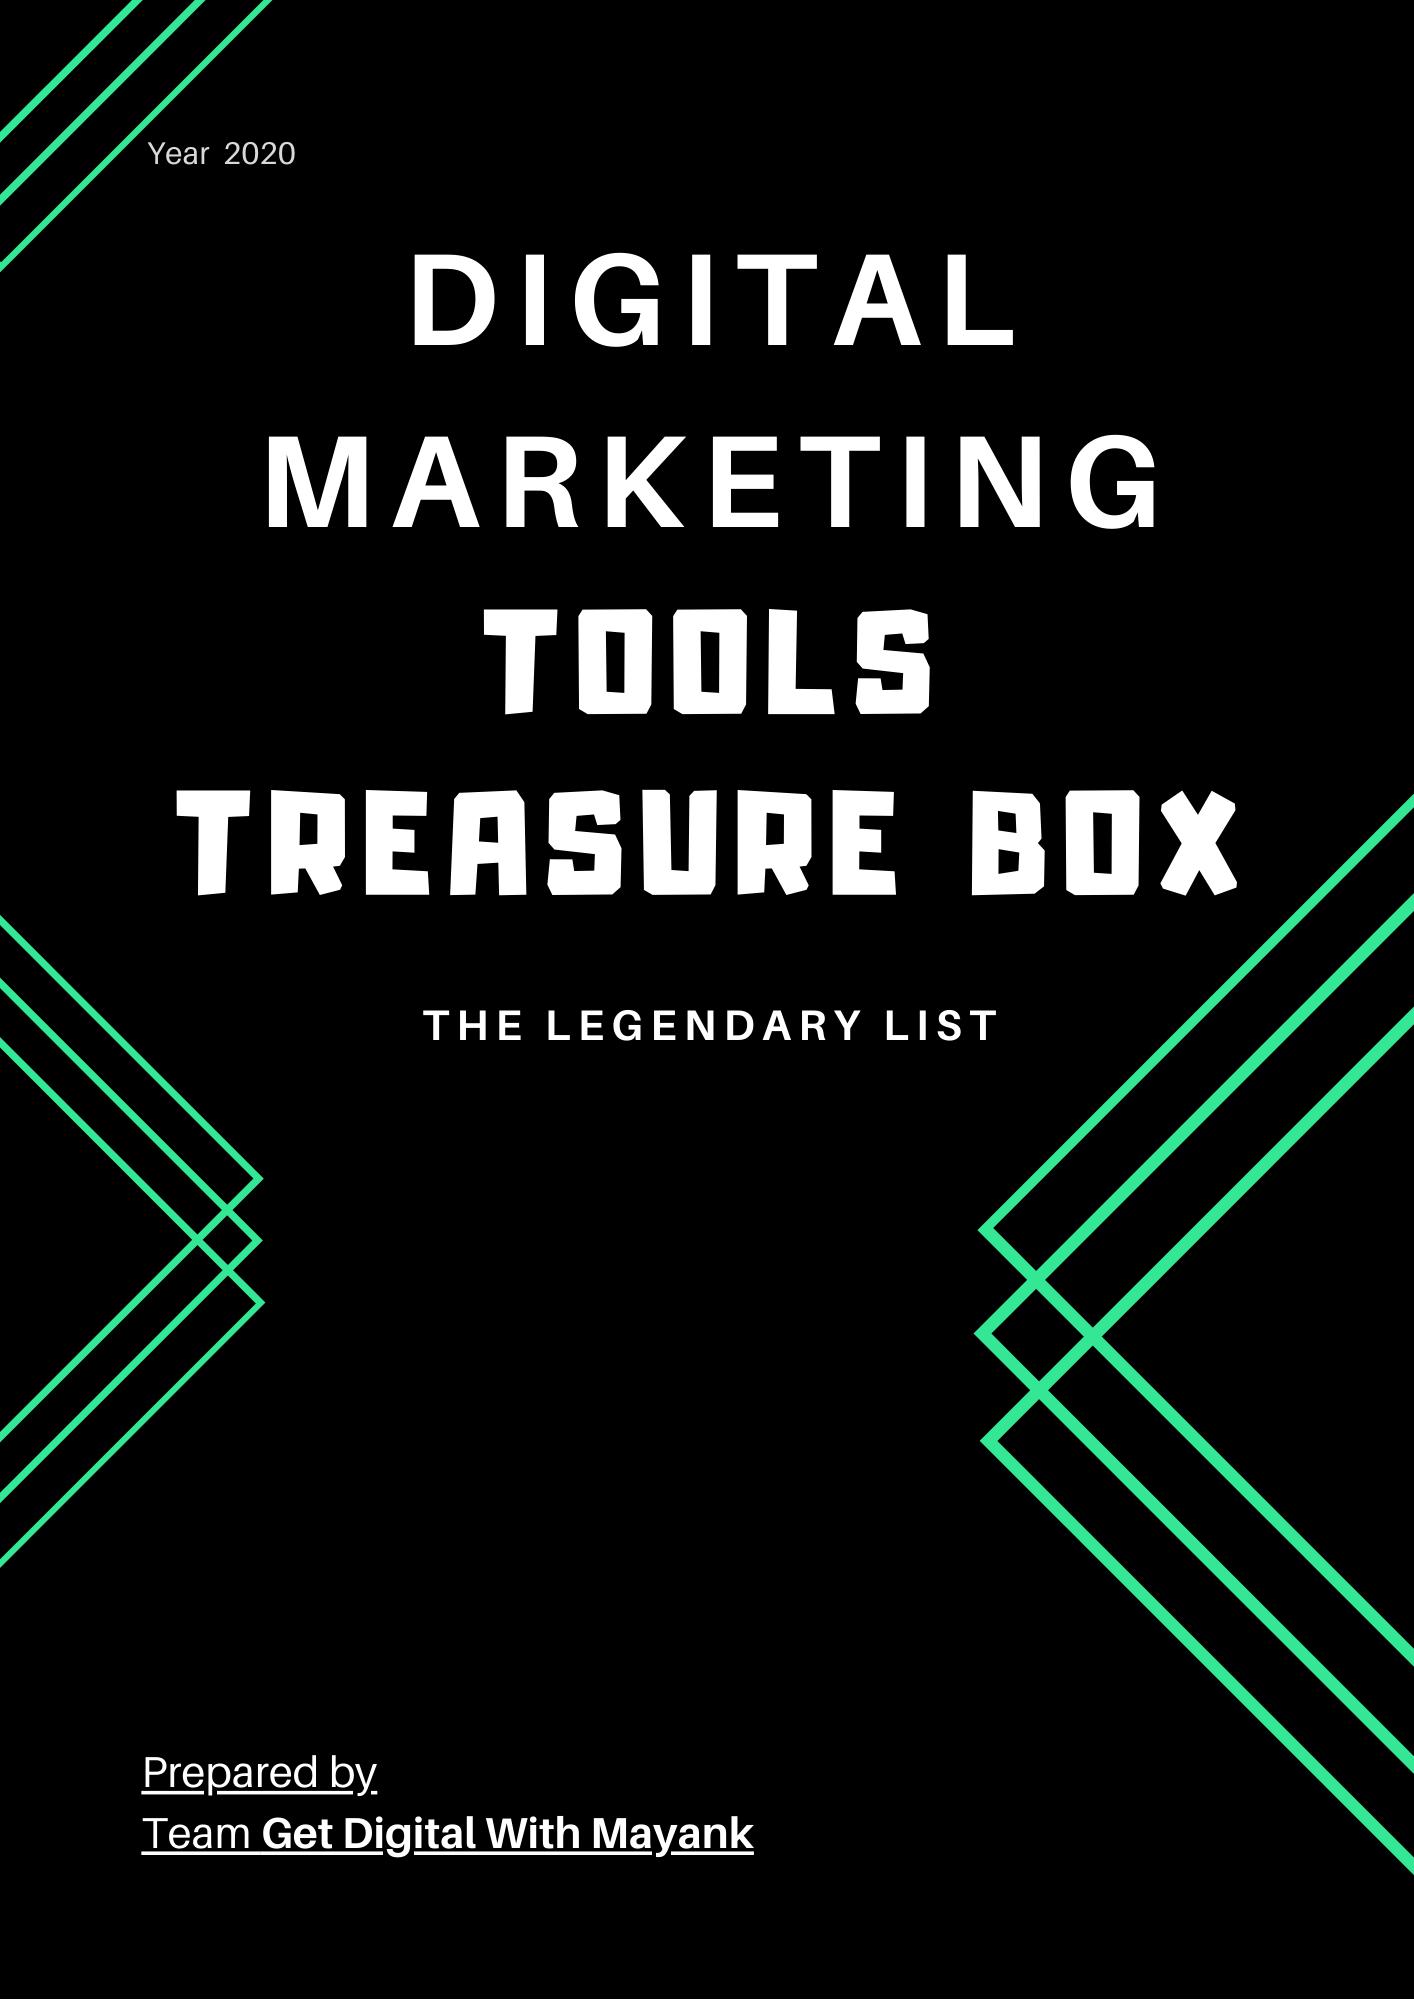 Legendary Digital Marketing Tools list - Get Digital With Mayank